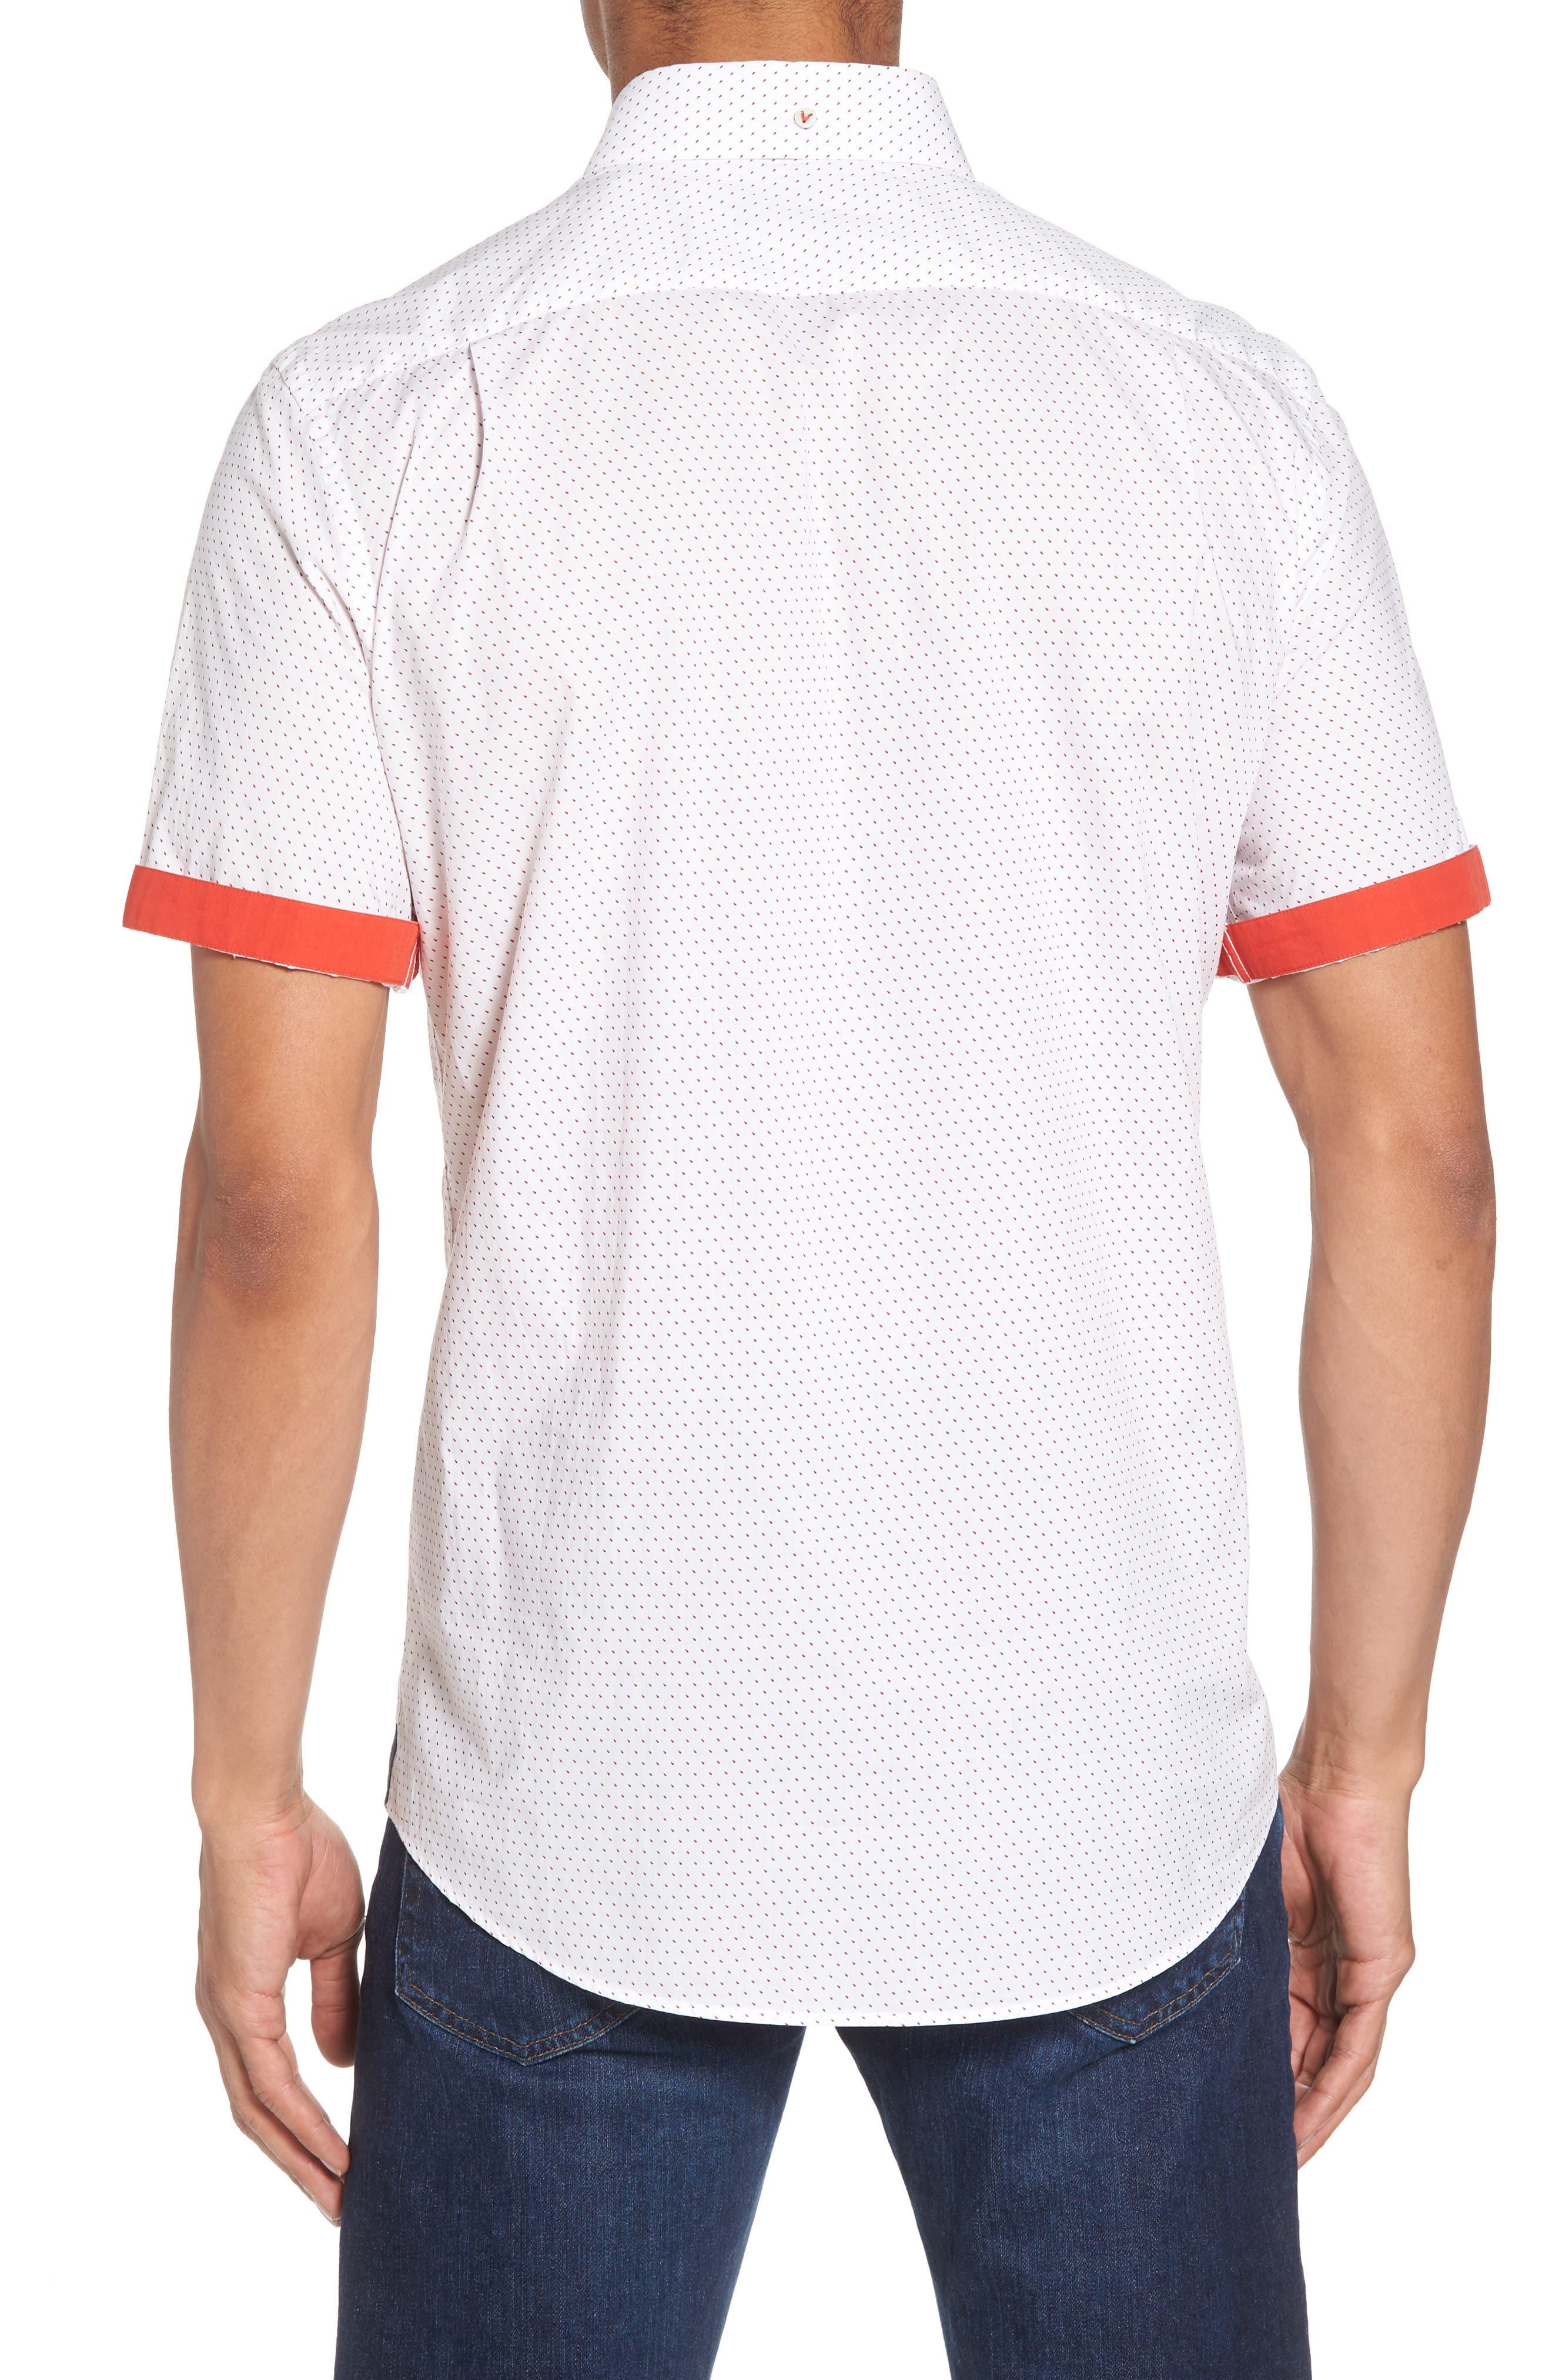 Dot Print Shirt,                             Alternate thumbnail 3, color,                             Canvas / Red Coral